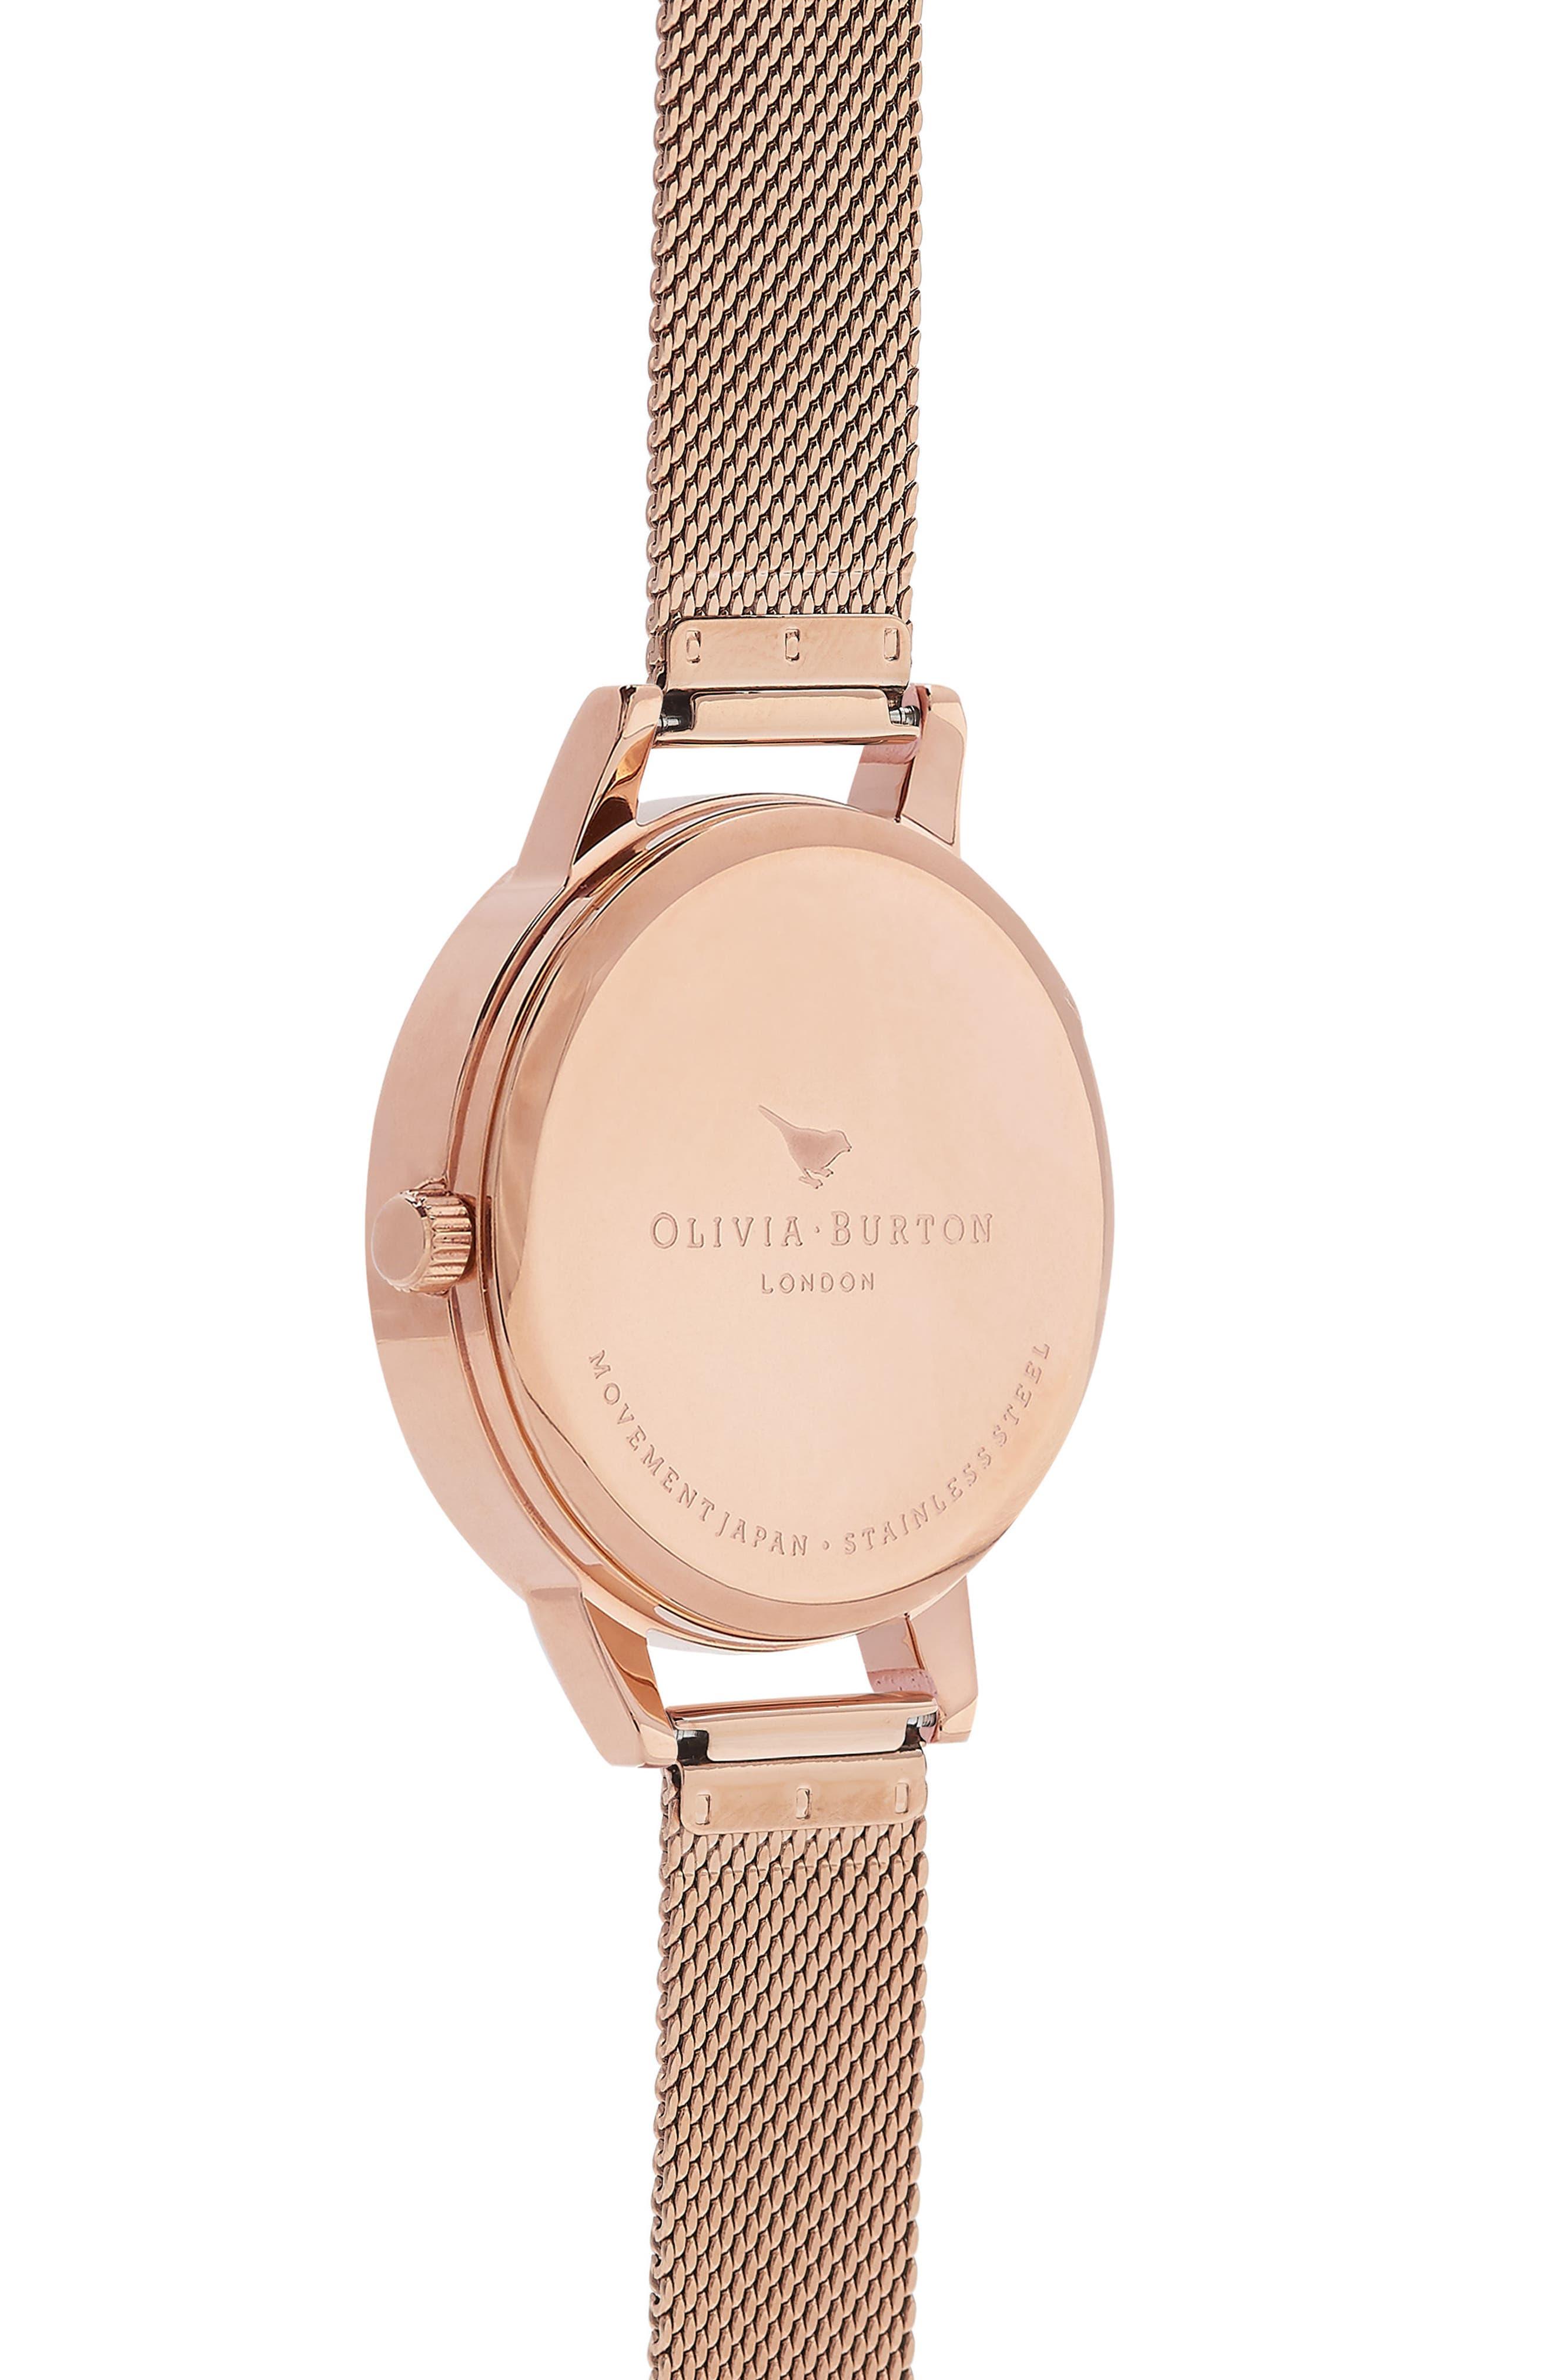 OLIVIA BURTON,                             Enchanted Garden Mesh Strap Watch, 30mm,                             Alternate thumbnail 2, color,                             ROSE GOLD/ FLORAL/ ROSE GOLD